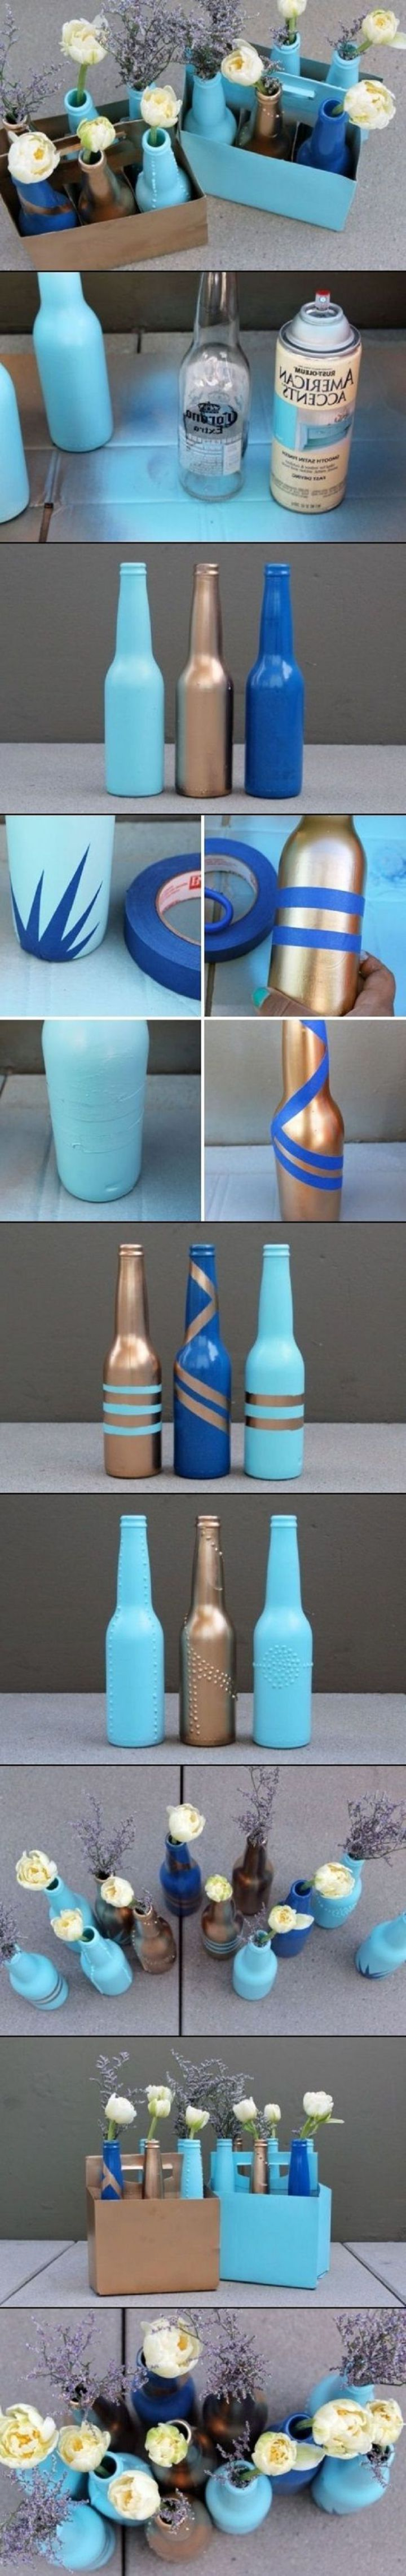 The 25+ best Empty glass bottles ideas on Pinterest | Braun how to ...